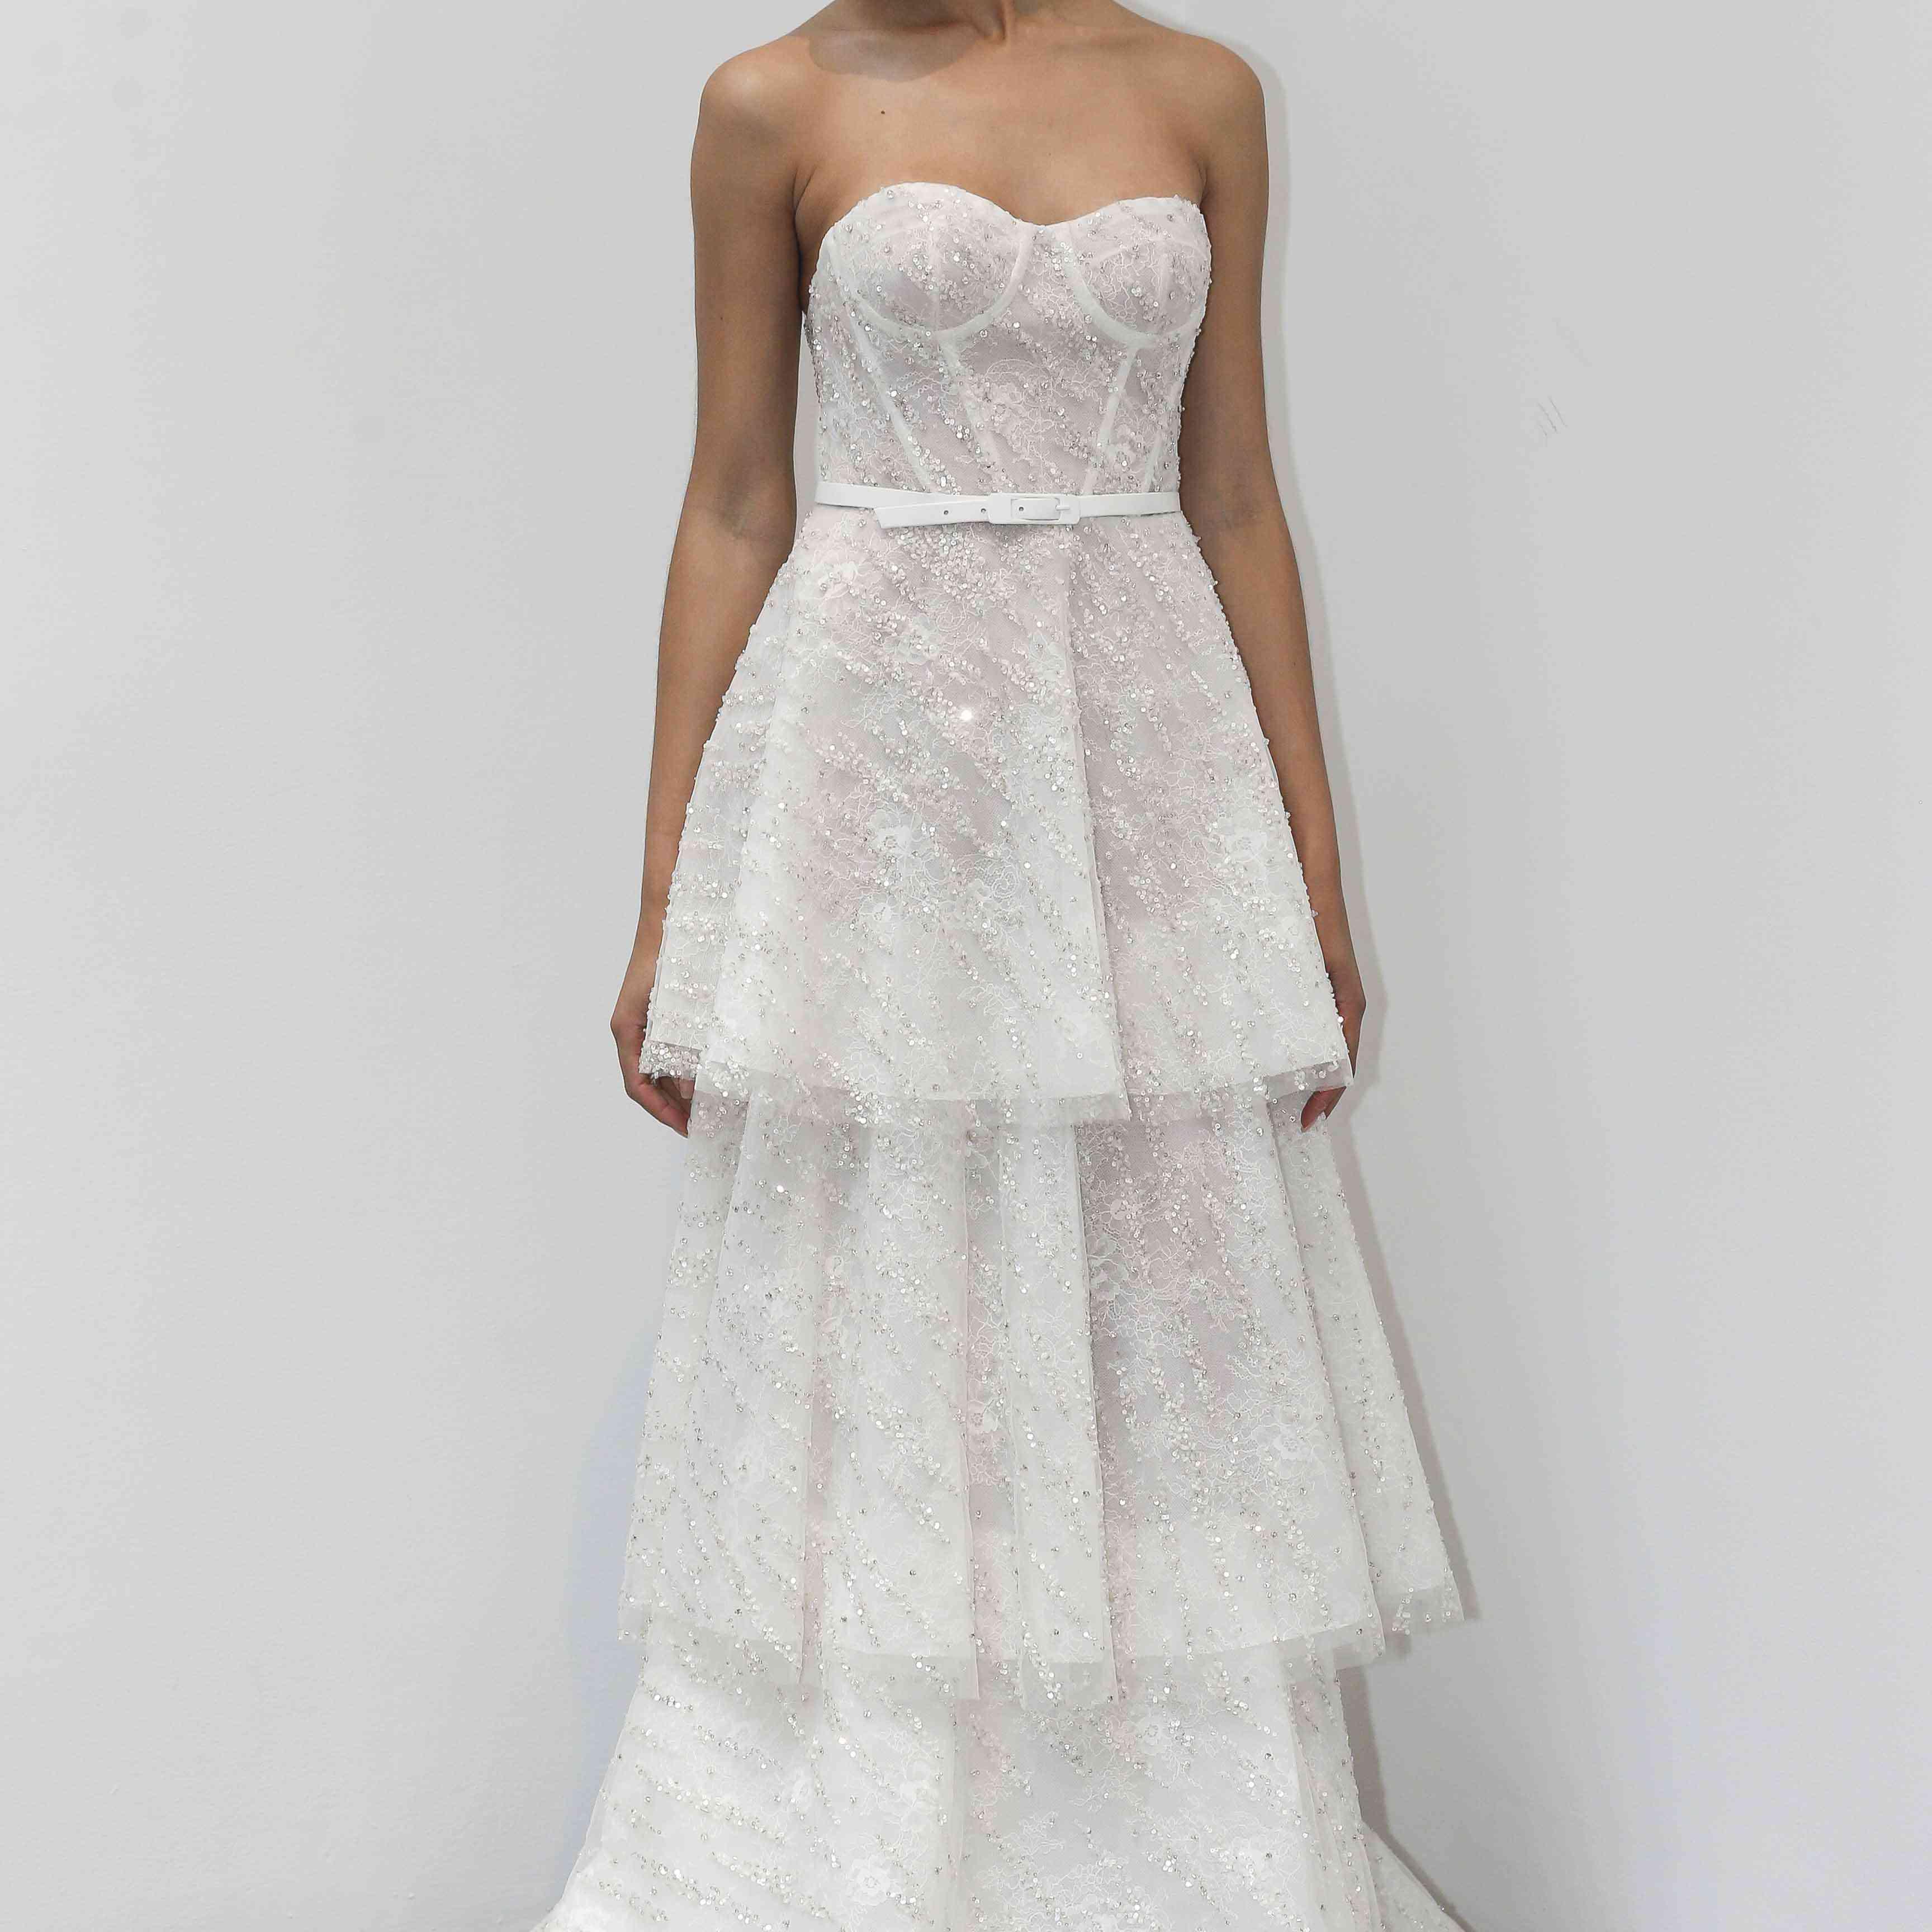 Lily Rose strapless wedding dress